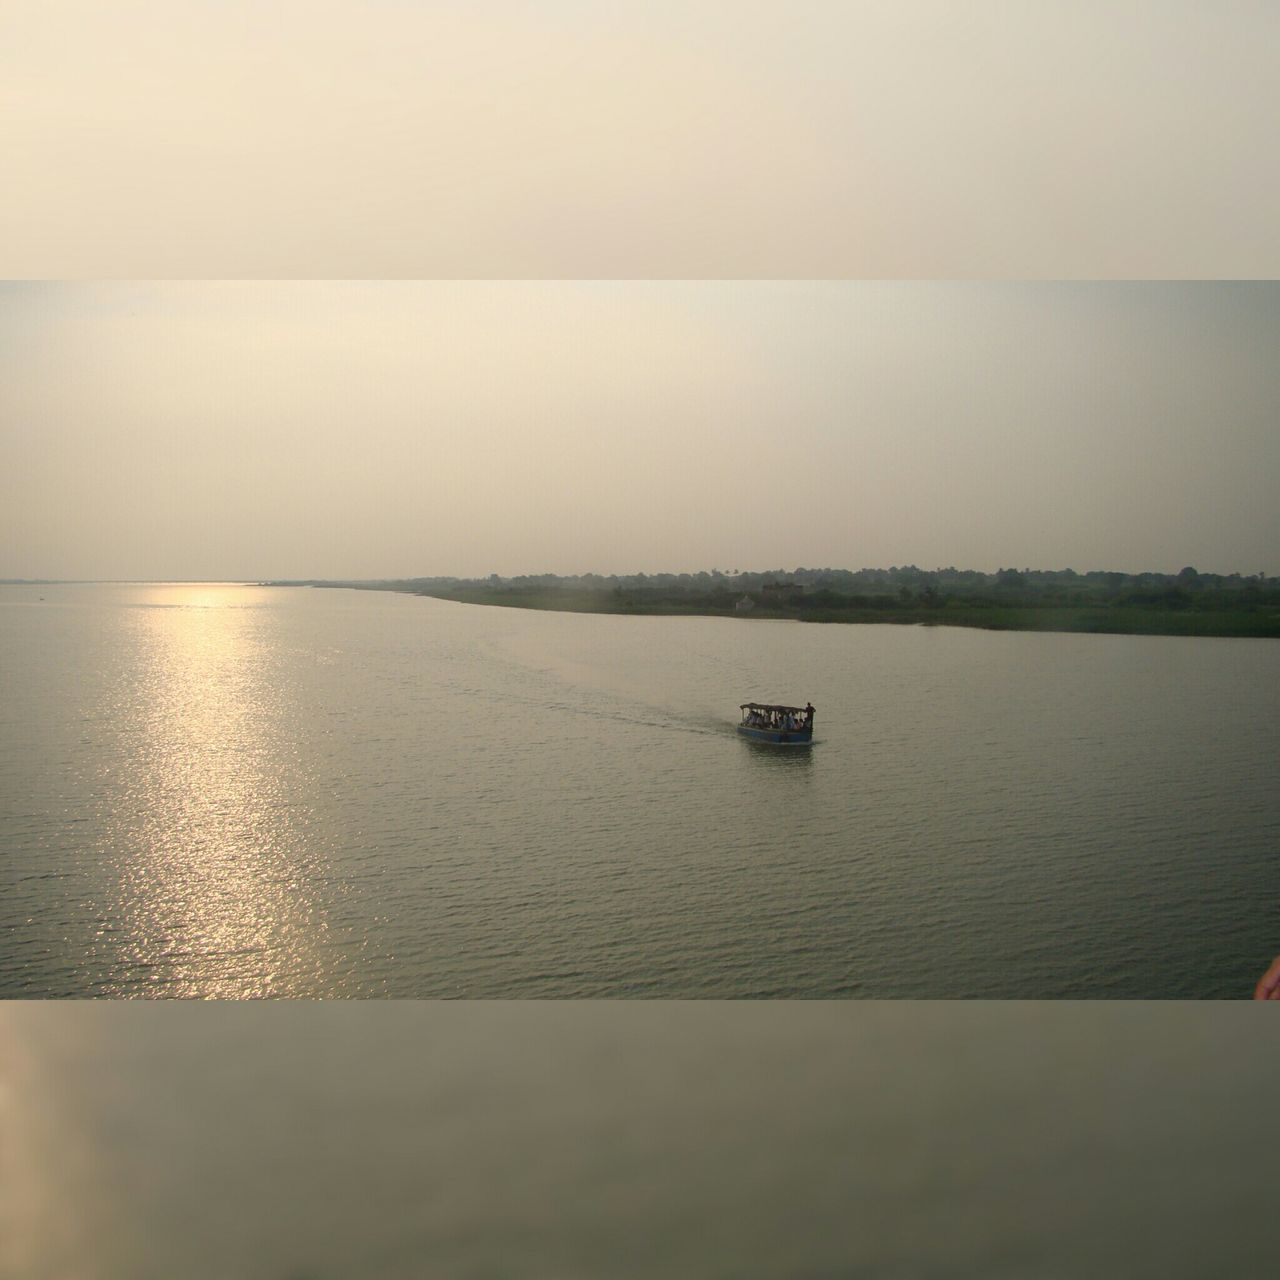 Kudalasangama River Boating Sunset India Photography Nammakarnataka Karnataka Throwback